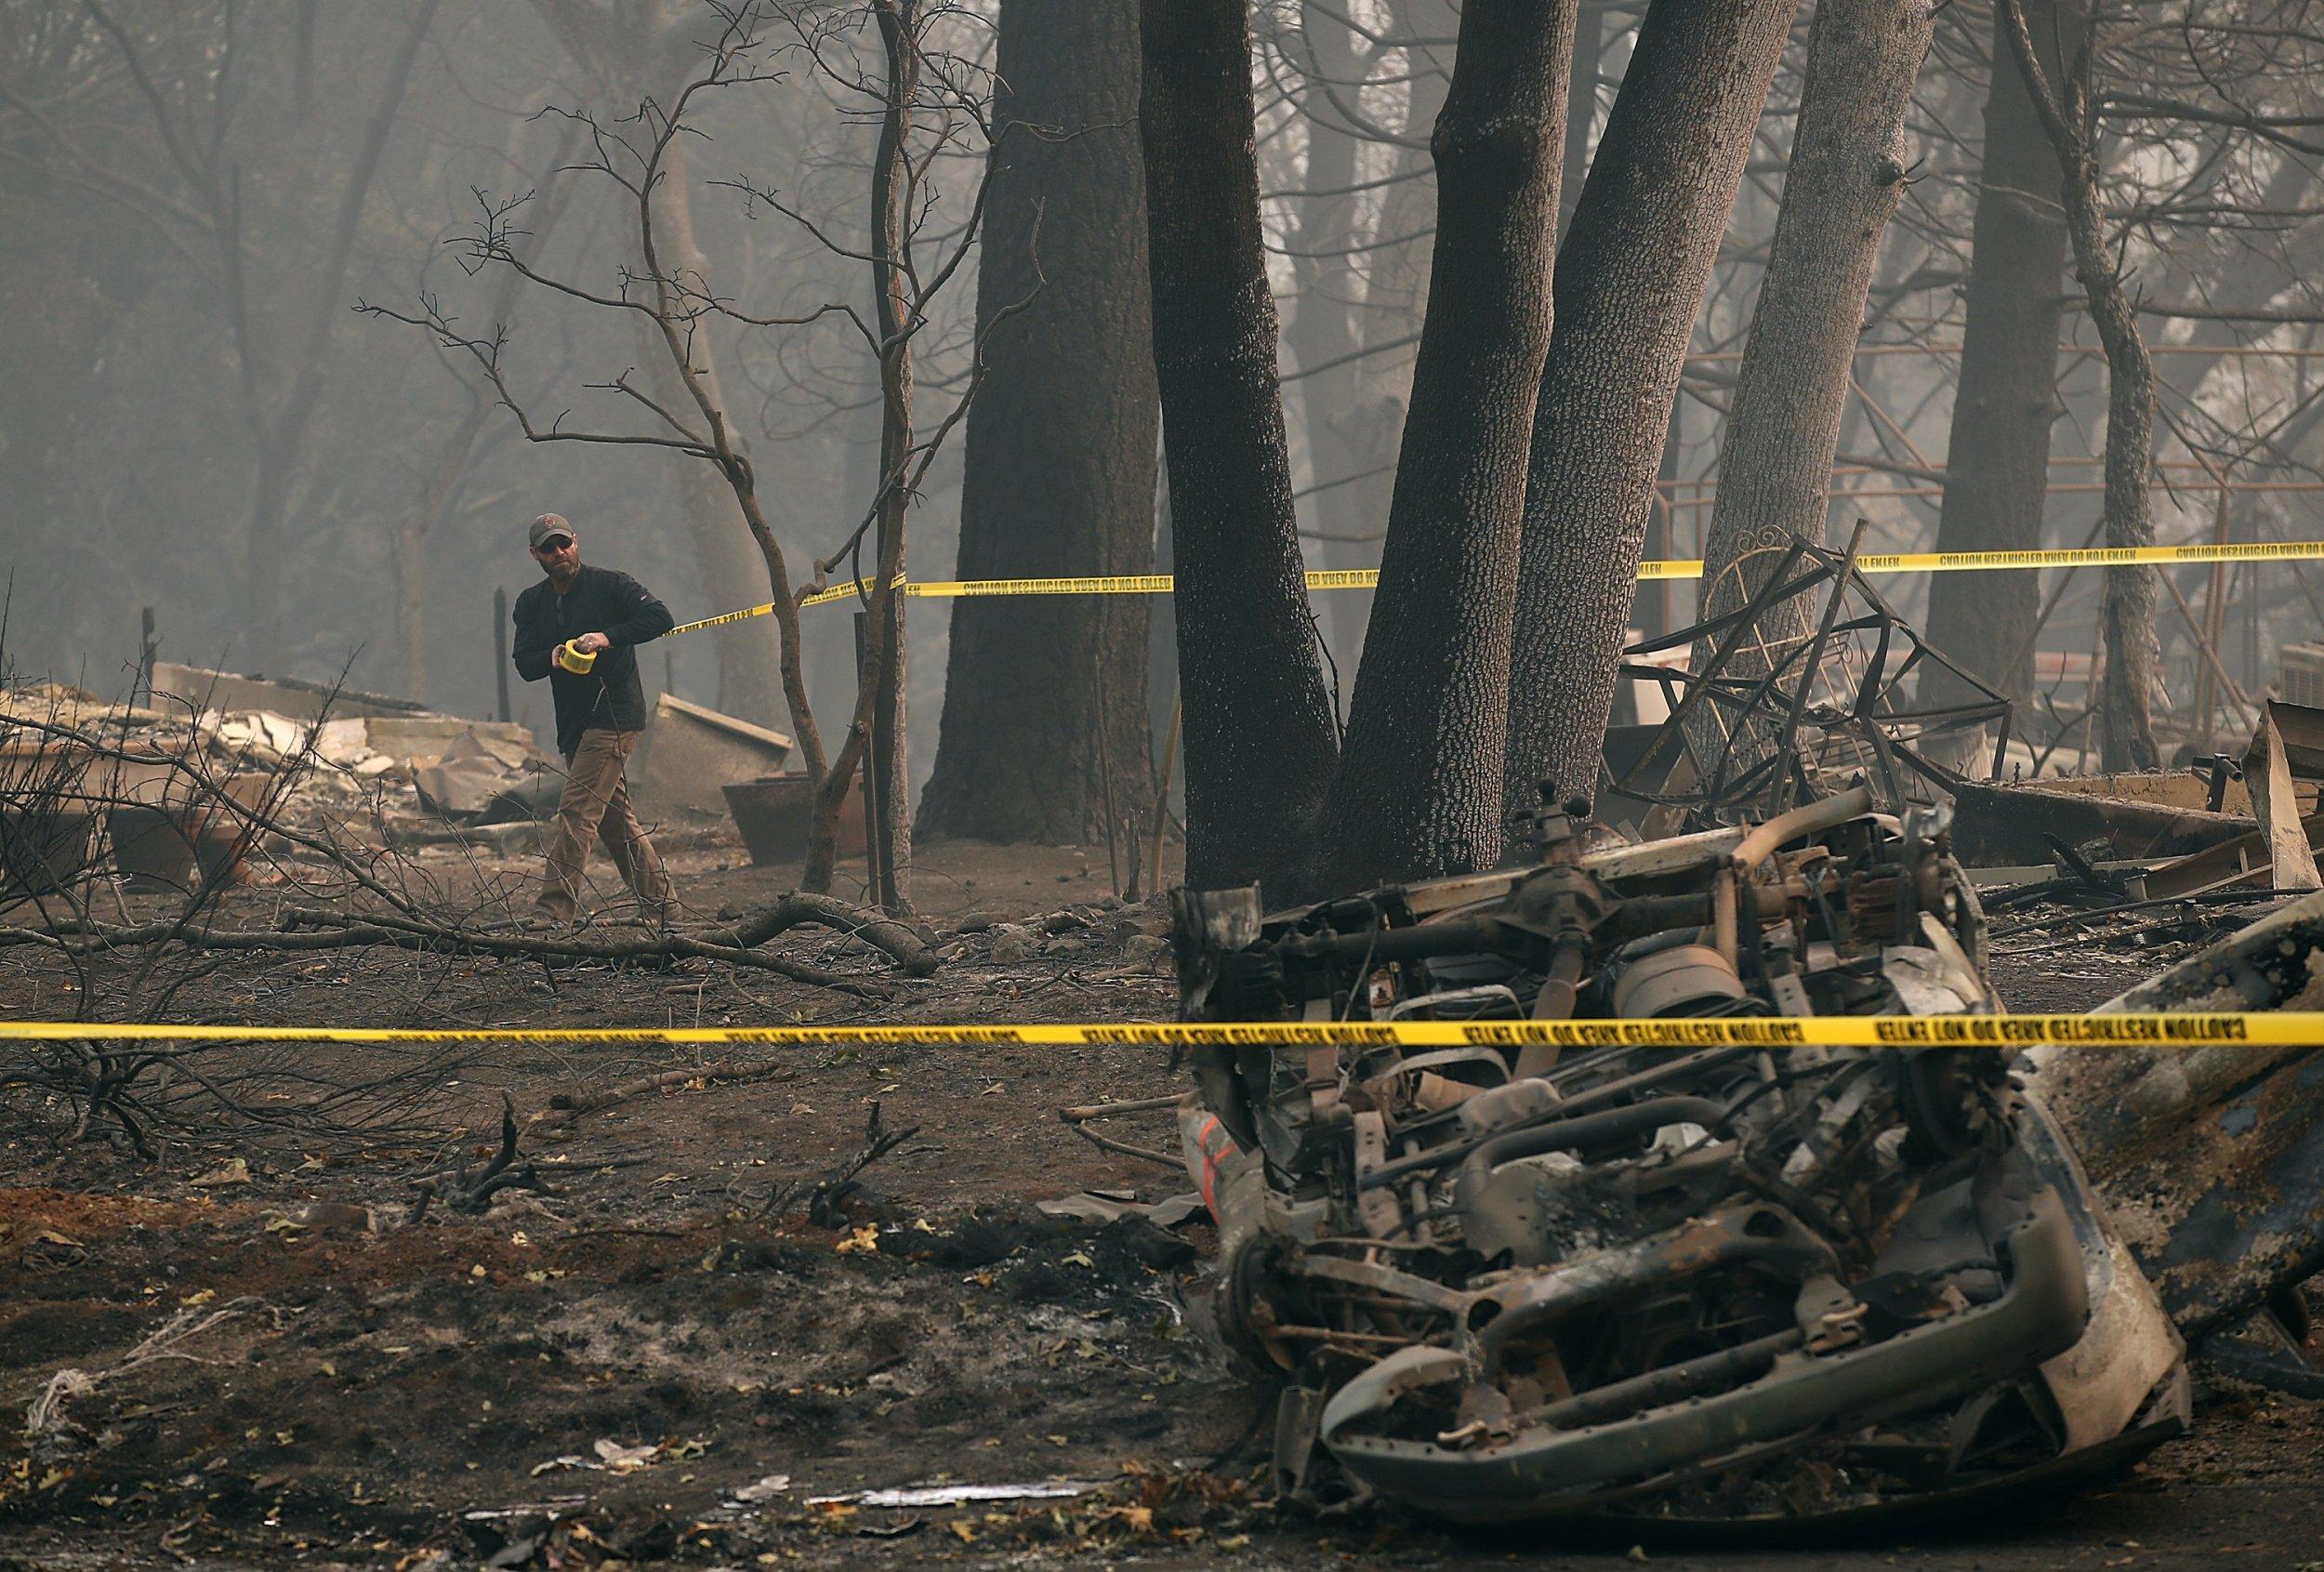 11_17_18_WildfiresContainment